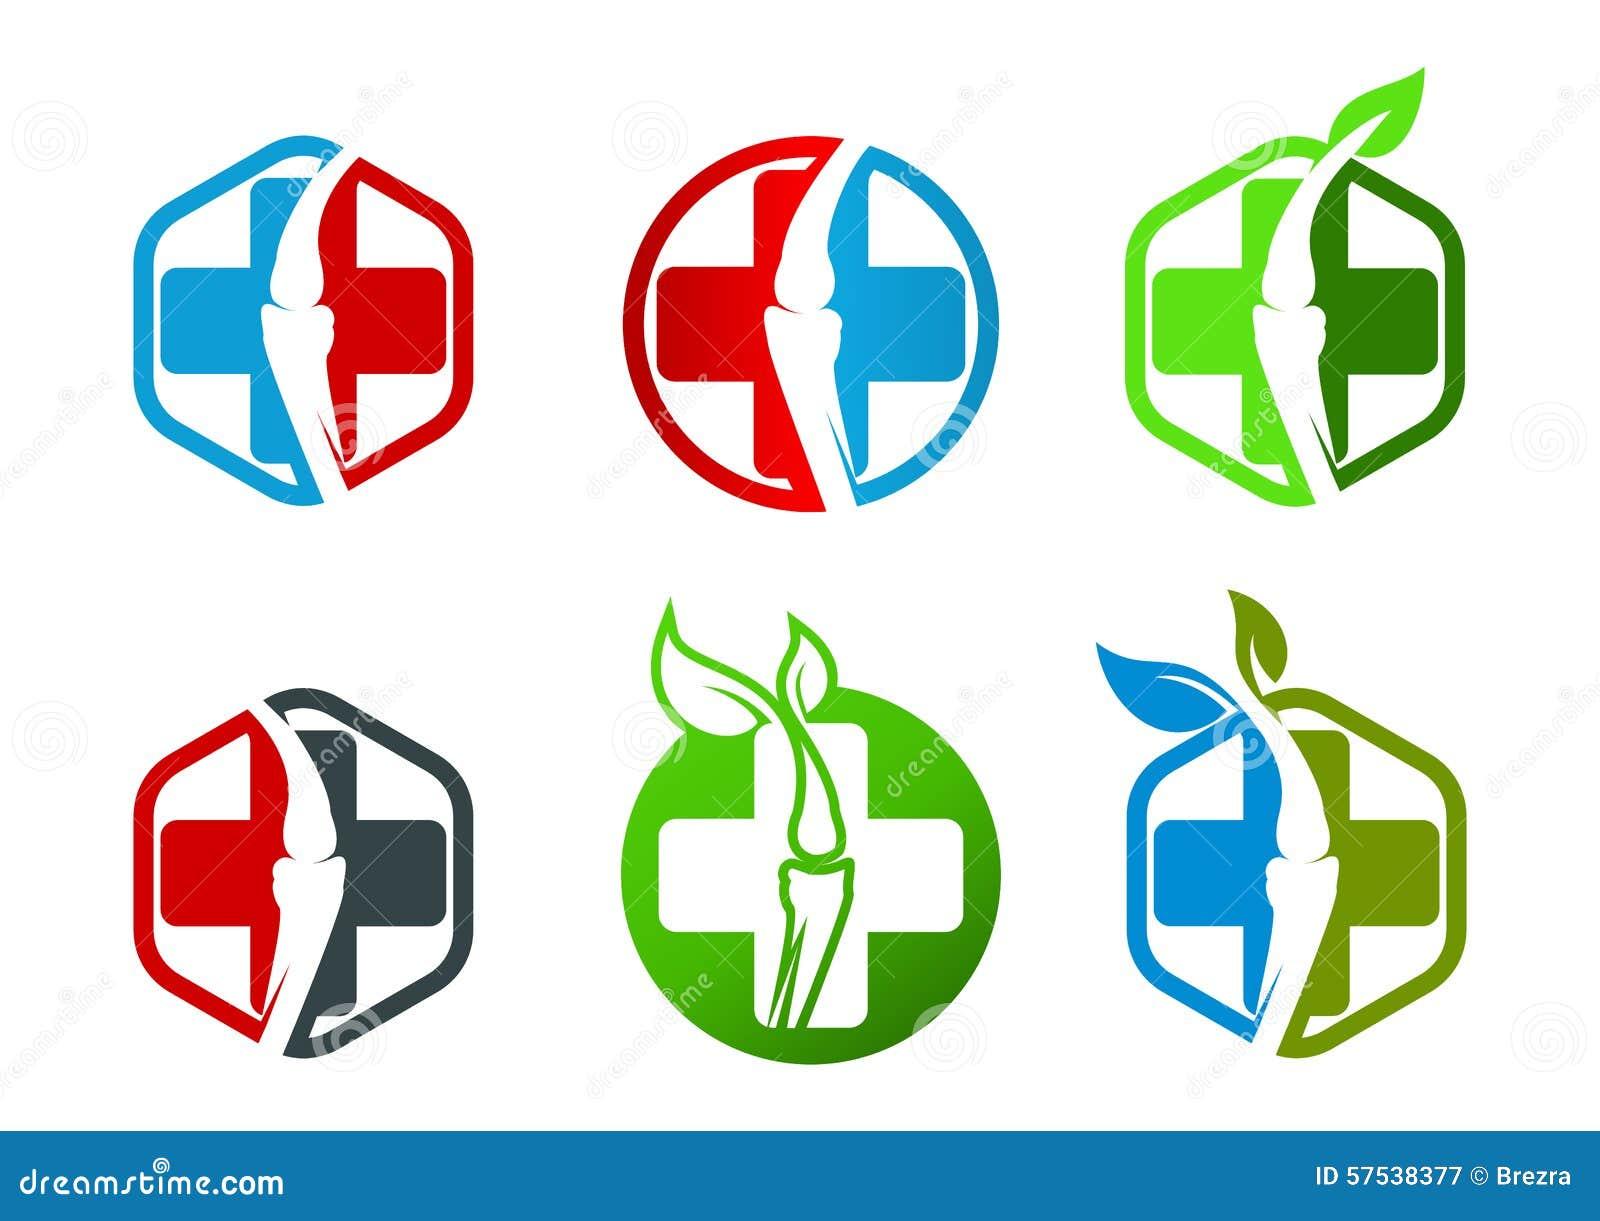 Orthopaedic Symbol